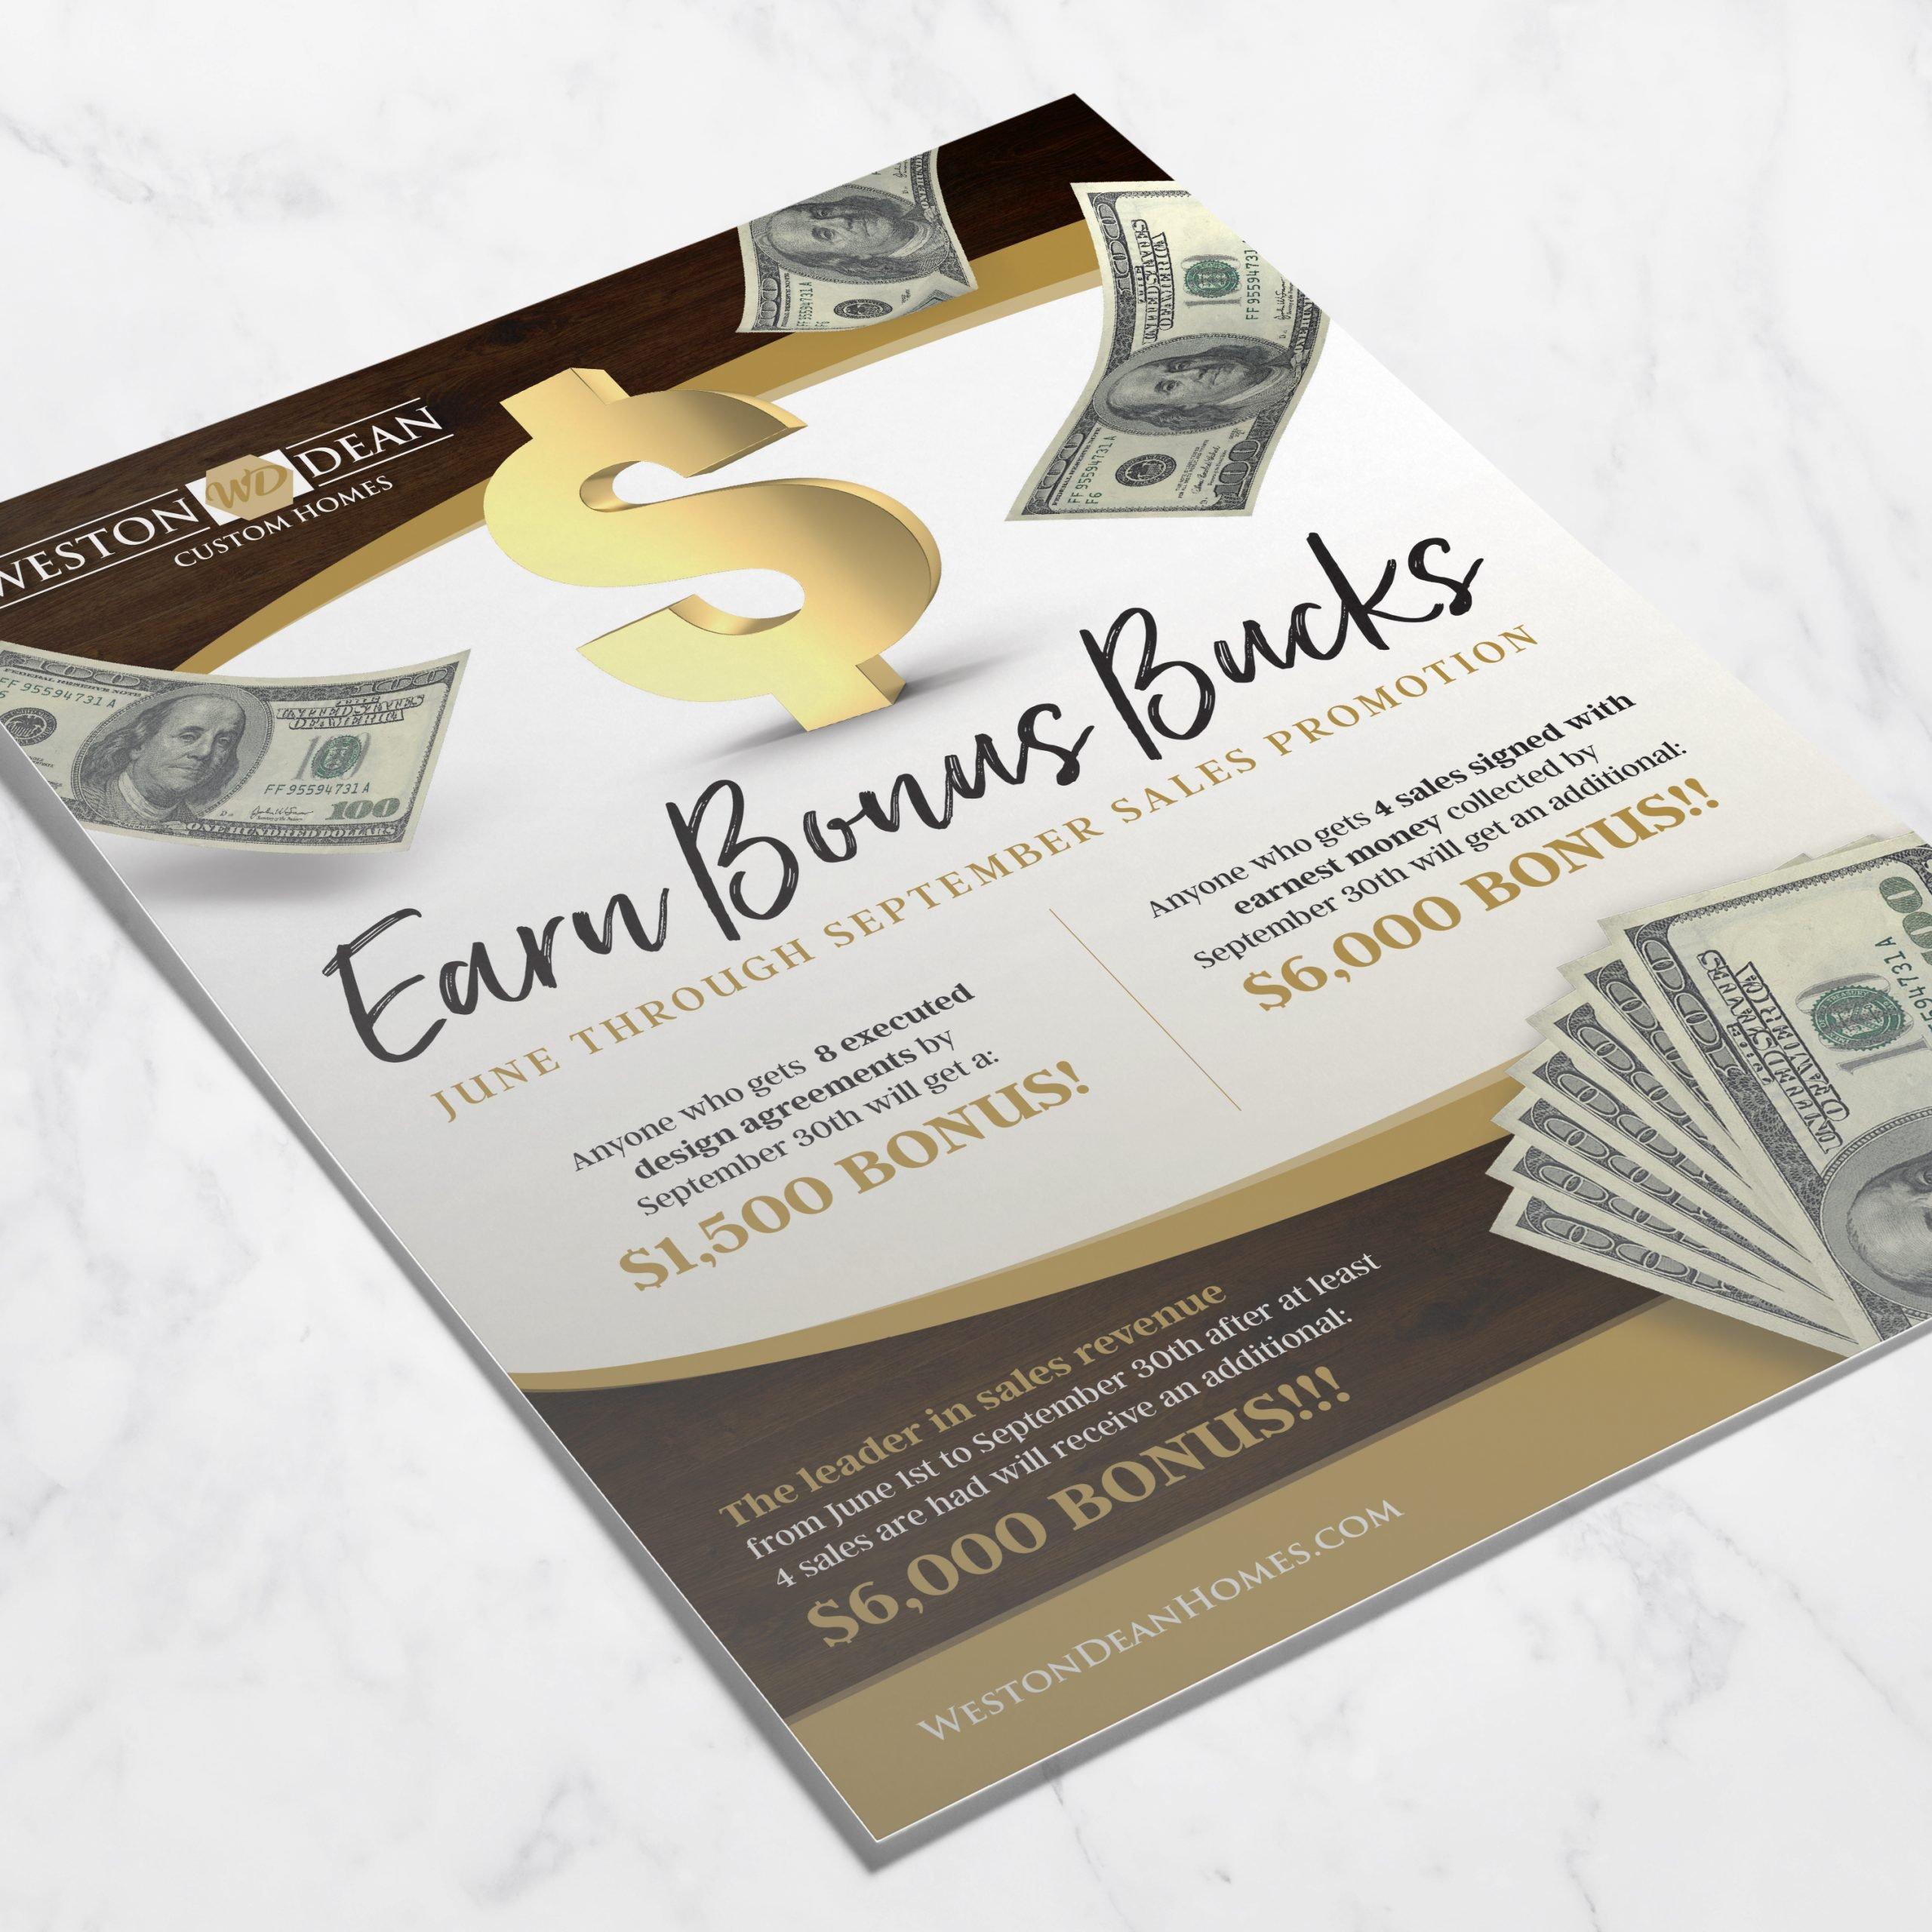 Weston Dean Custom Homes Incentive Flyer